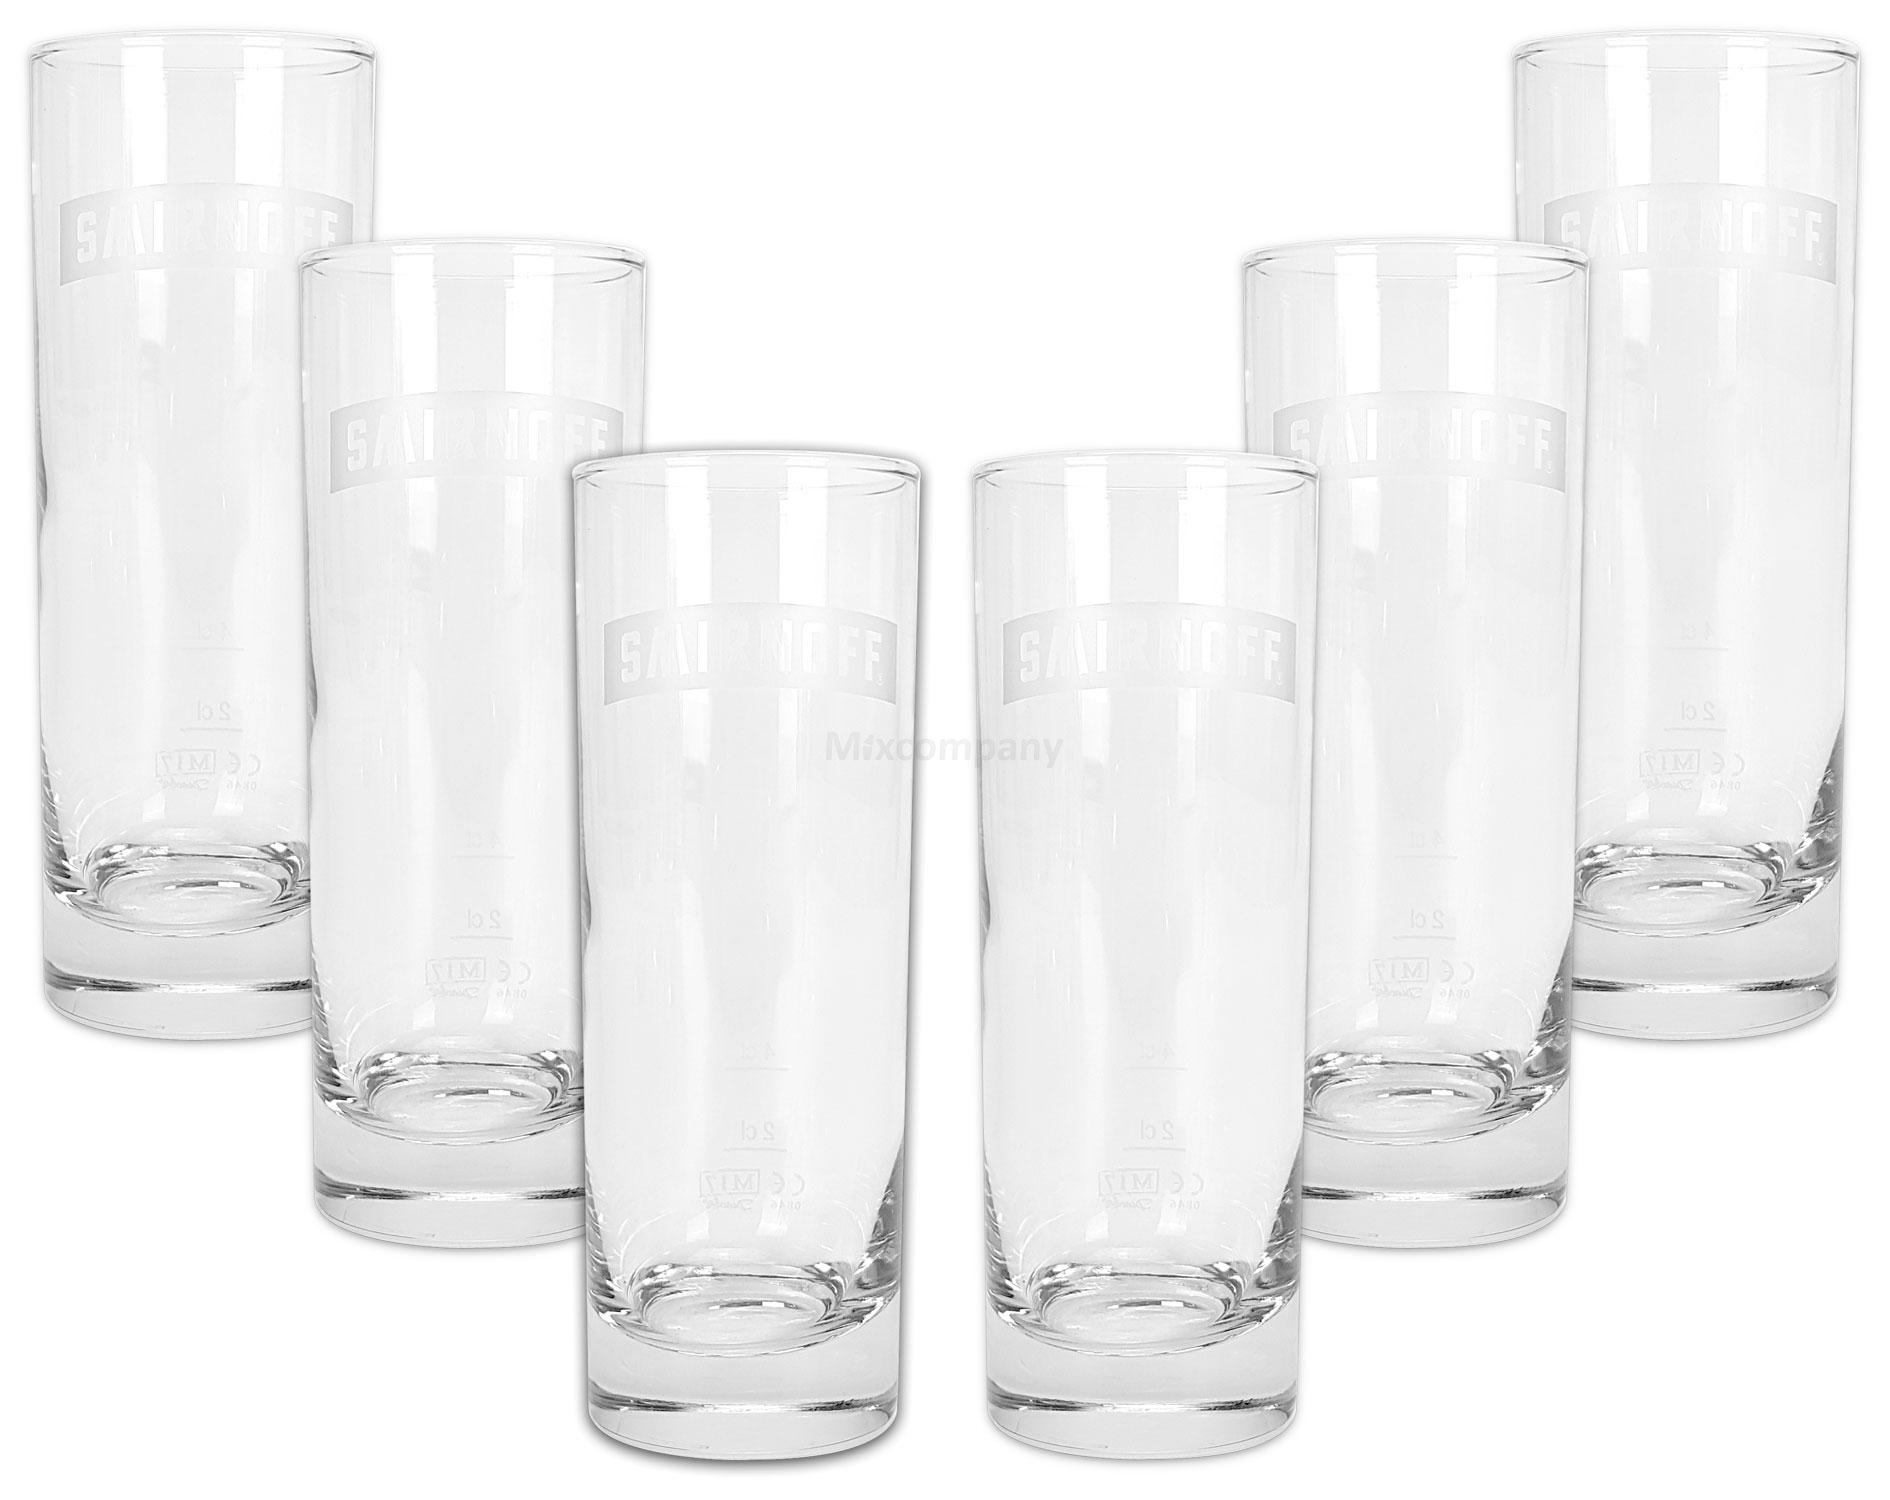 Smirnoff Vodka Cocktail Longdrink Glas Gläser Set - 6x Longdrinkgläser 2/4cl geeicht